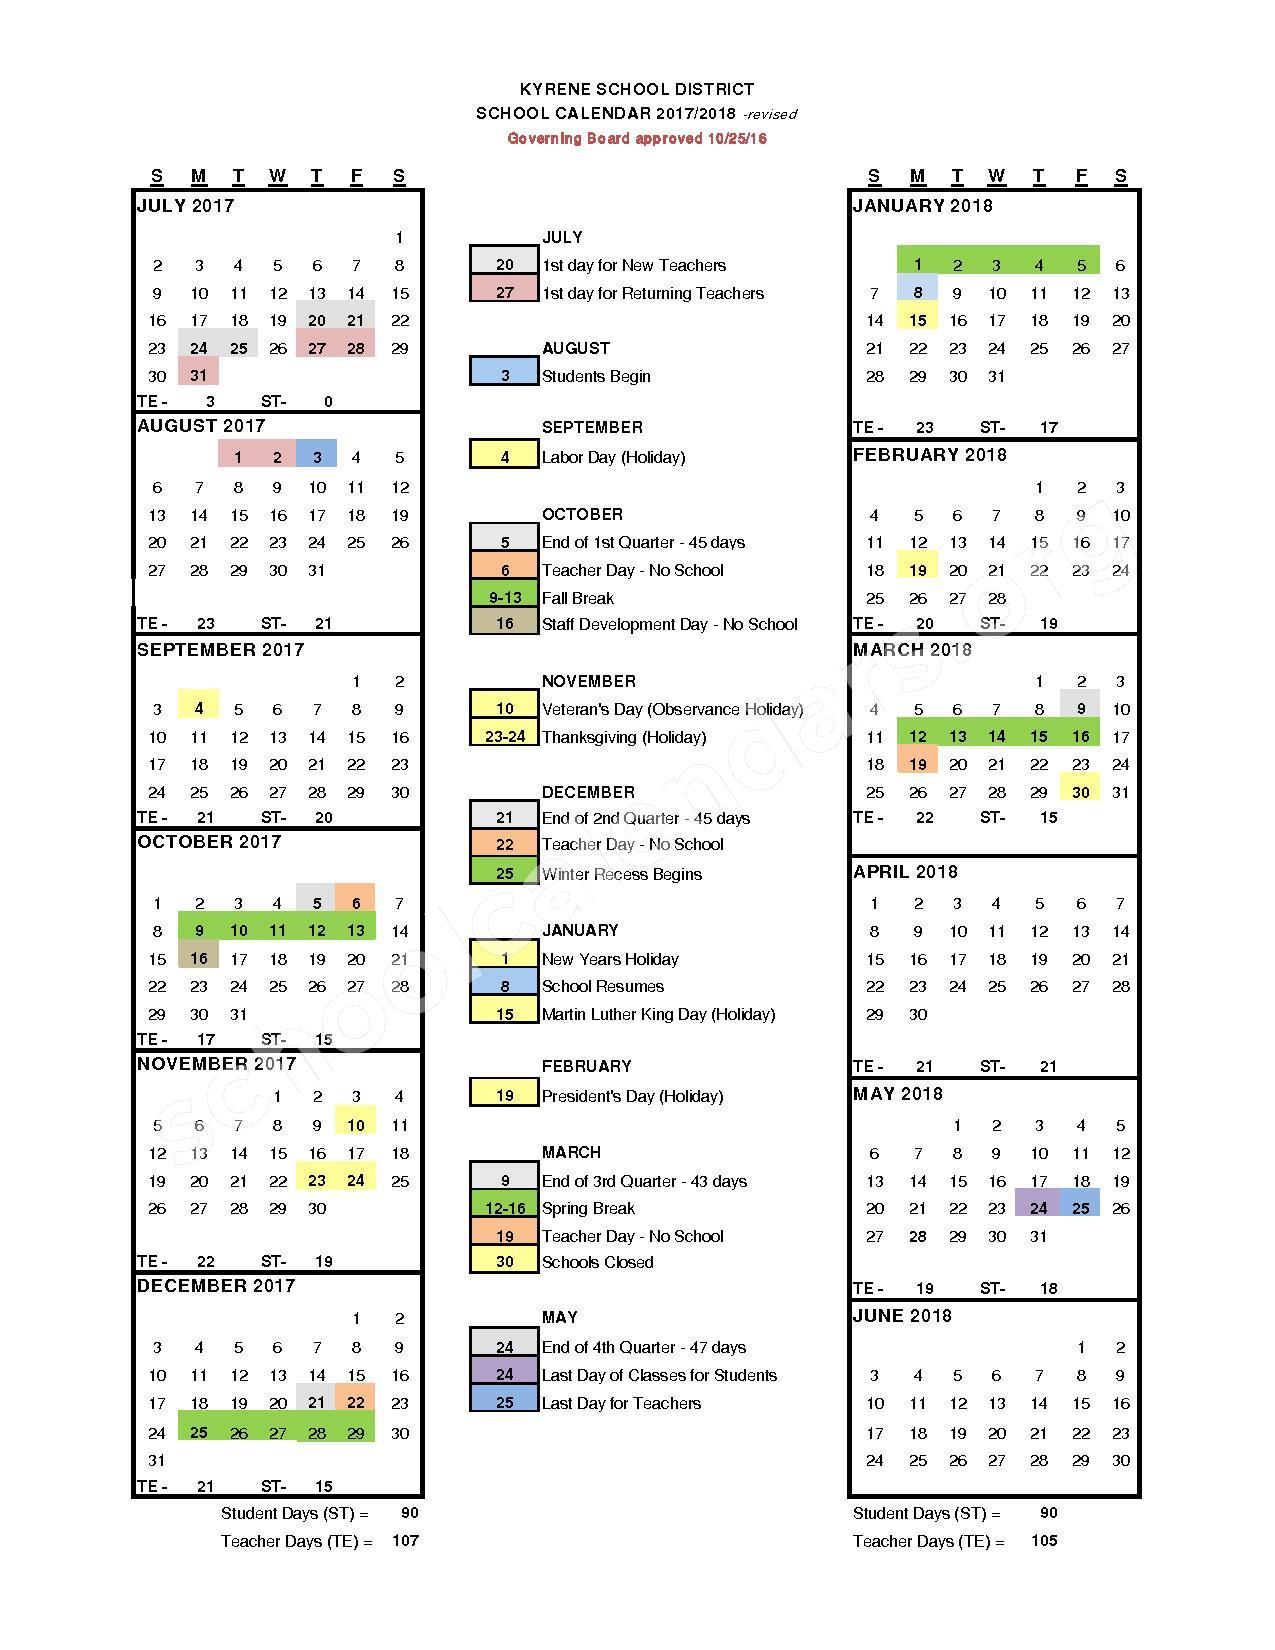 2017 - 2018 School Calendar – Kyrene Akimel A-Al Middle School – page 1